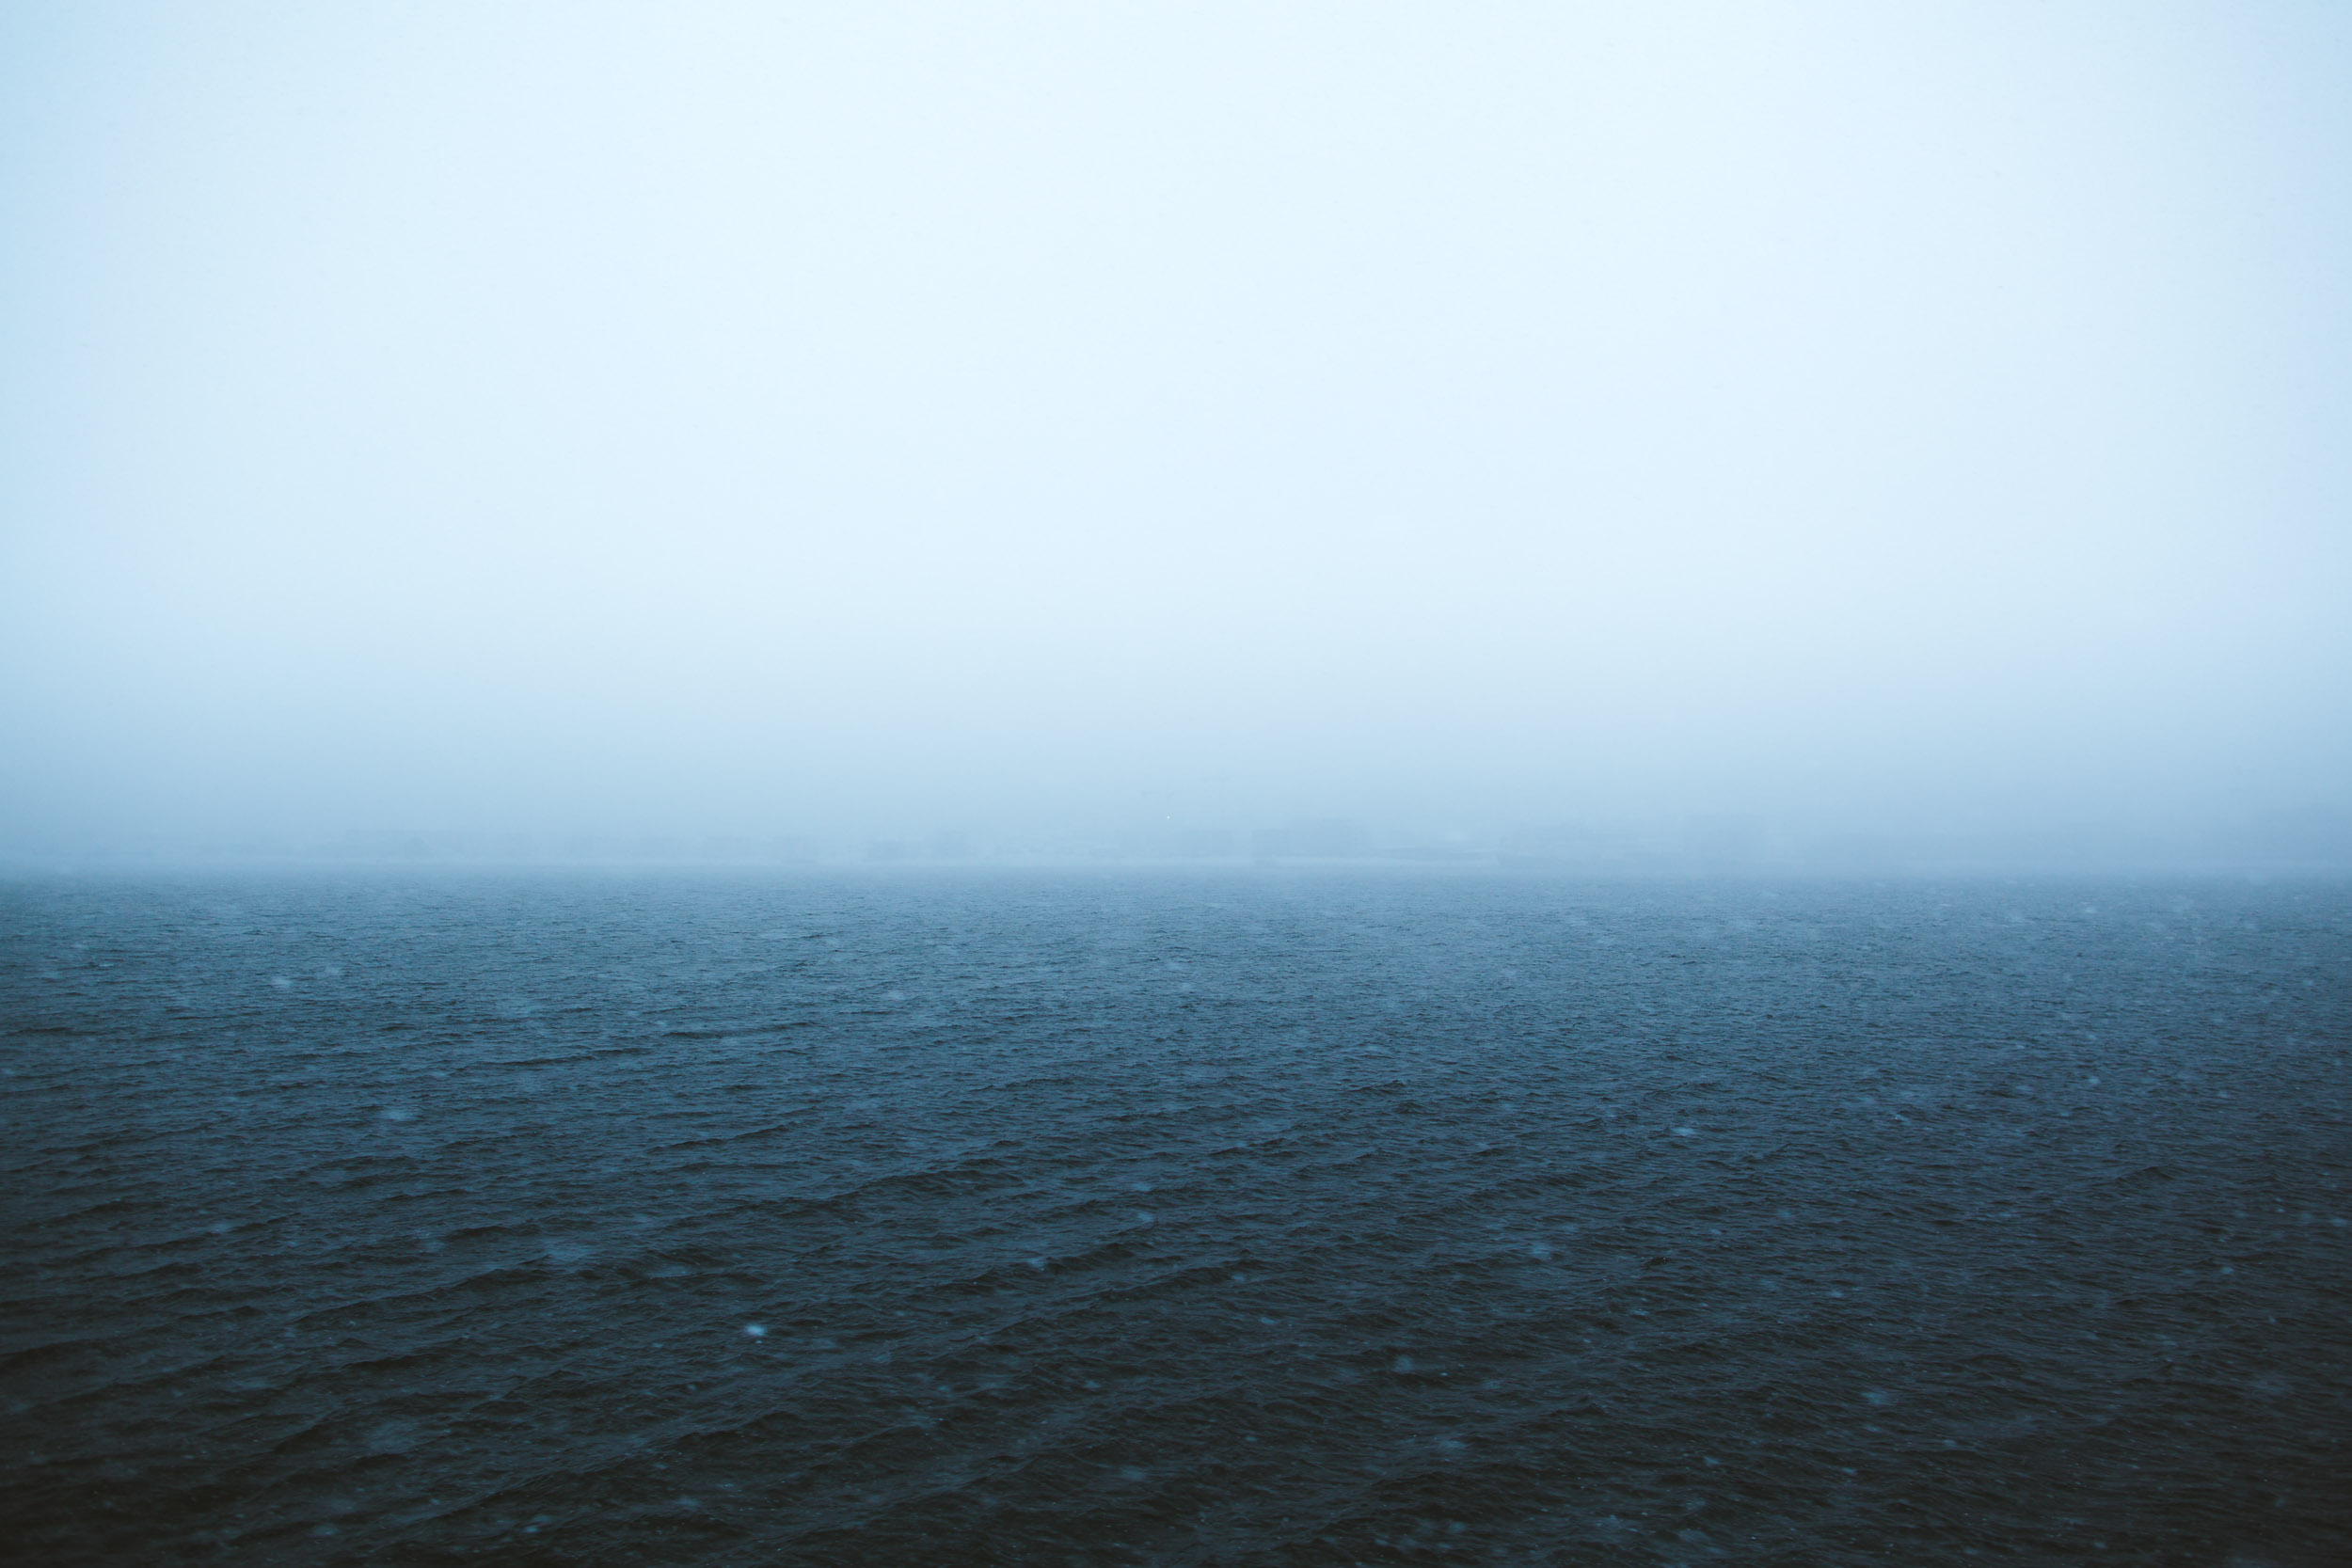 Rolig sjø i snøvær